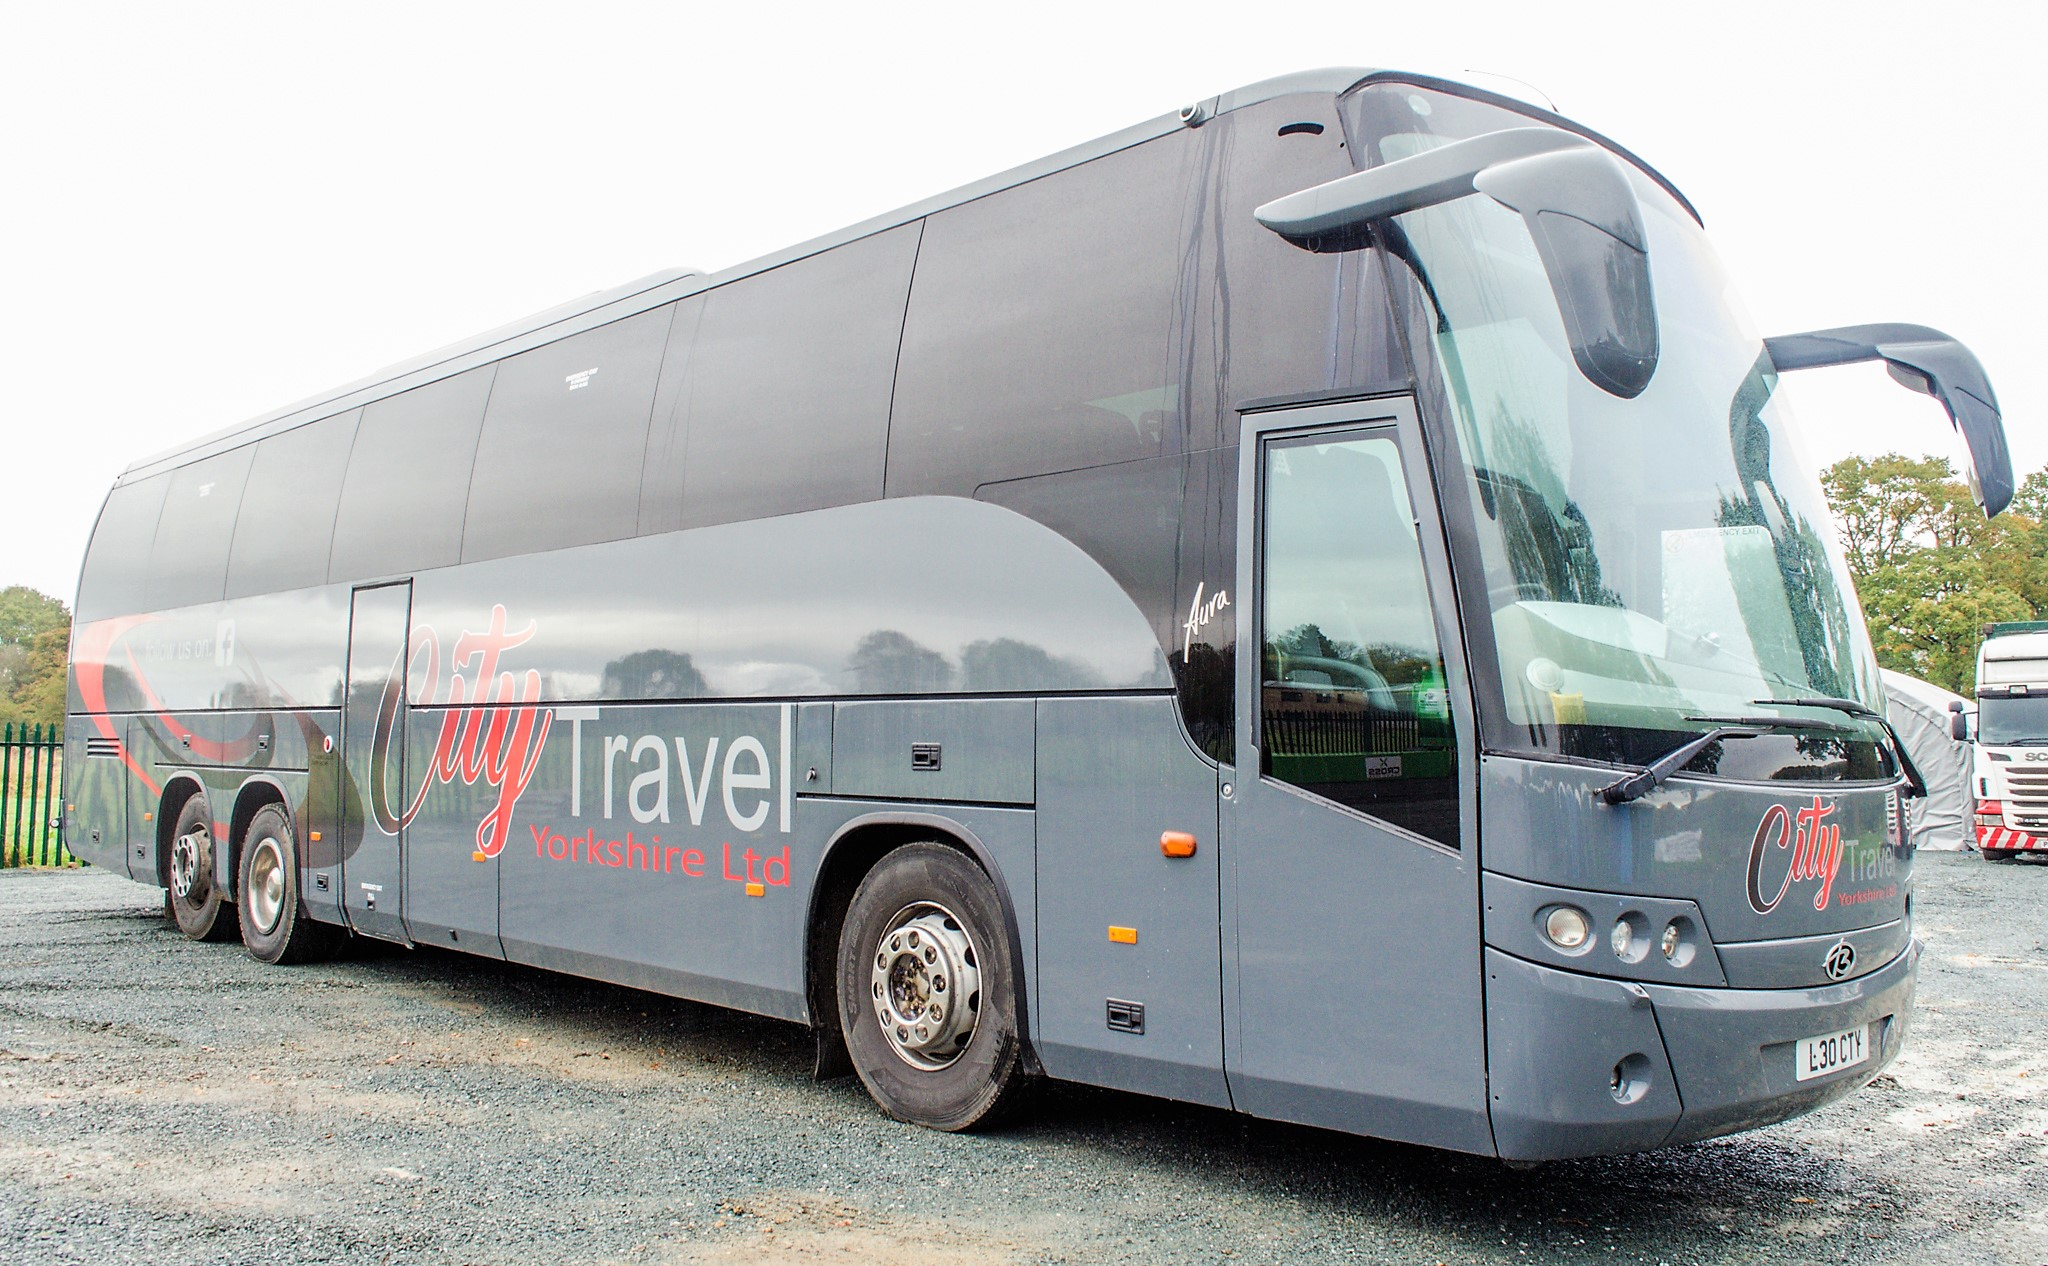 MAN F2000 Beulas Aura 54 seat luxury coach Registration Number: KC08 KTC Date of Registration: 30/ - Image 2 of 19